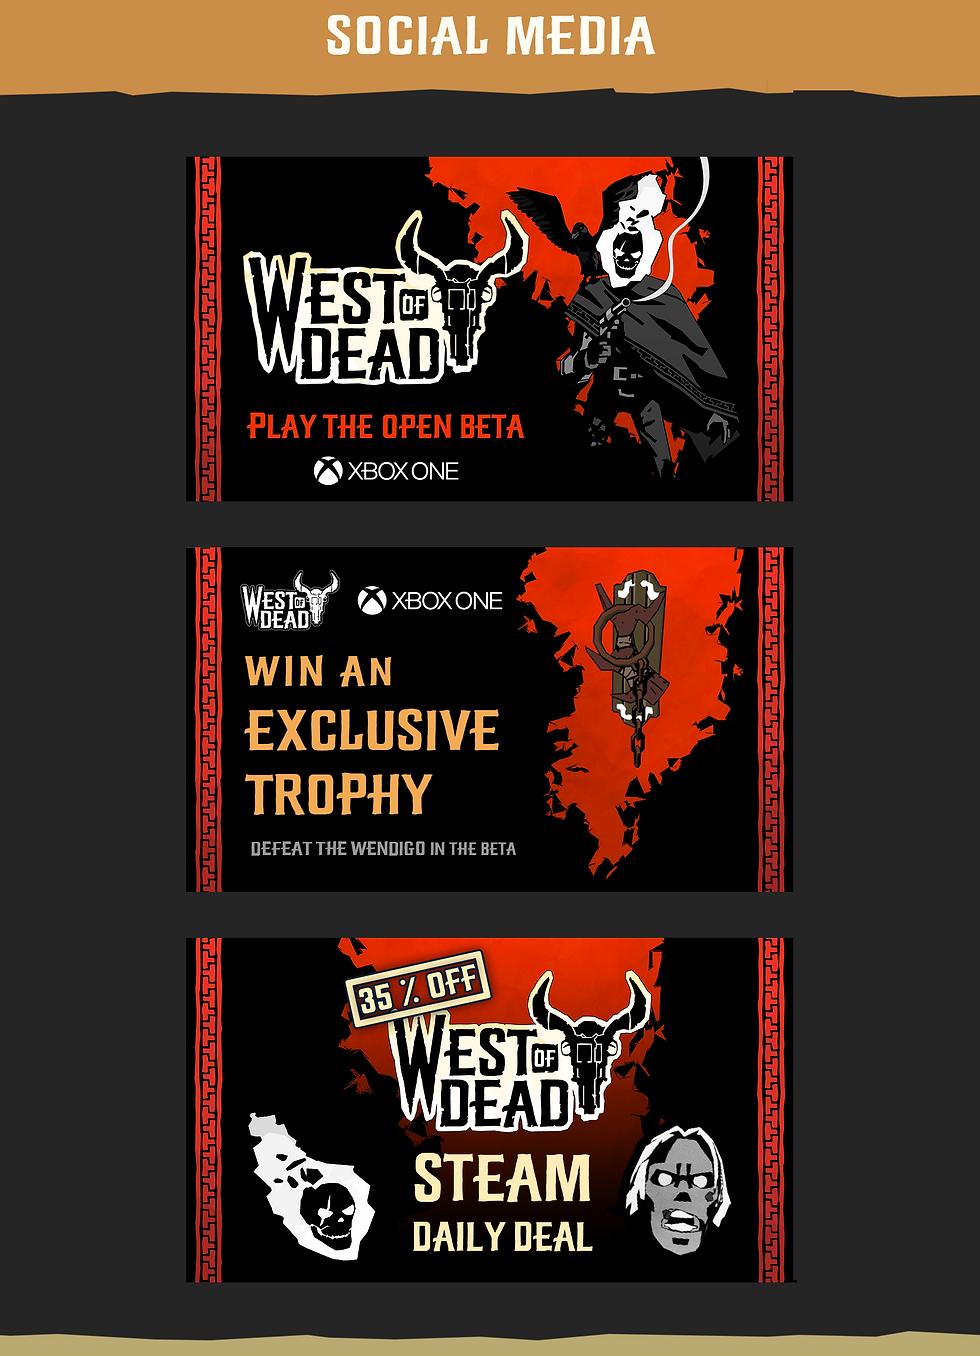 WestofDead_Portfolio_4.png